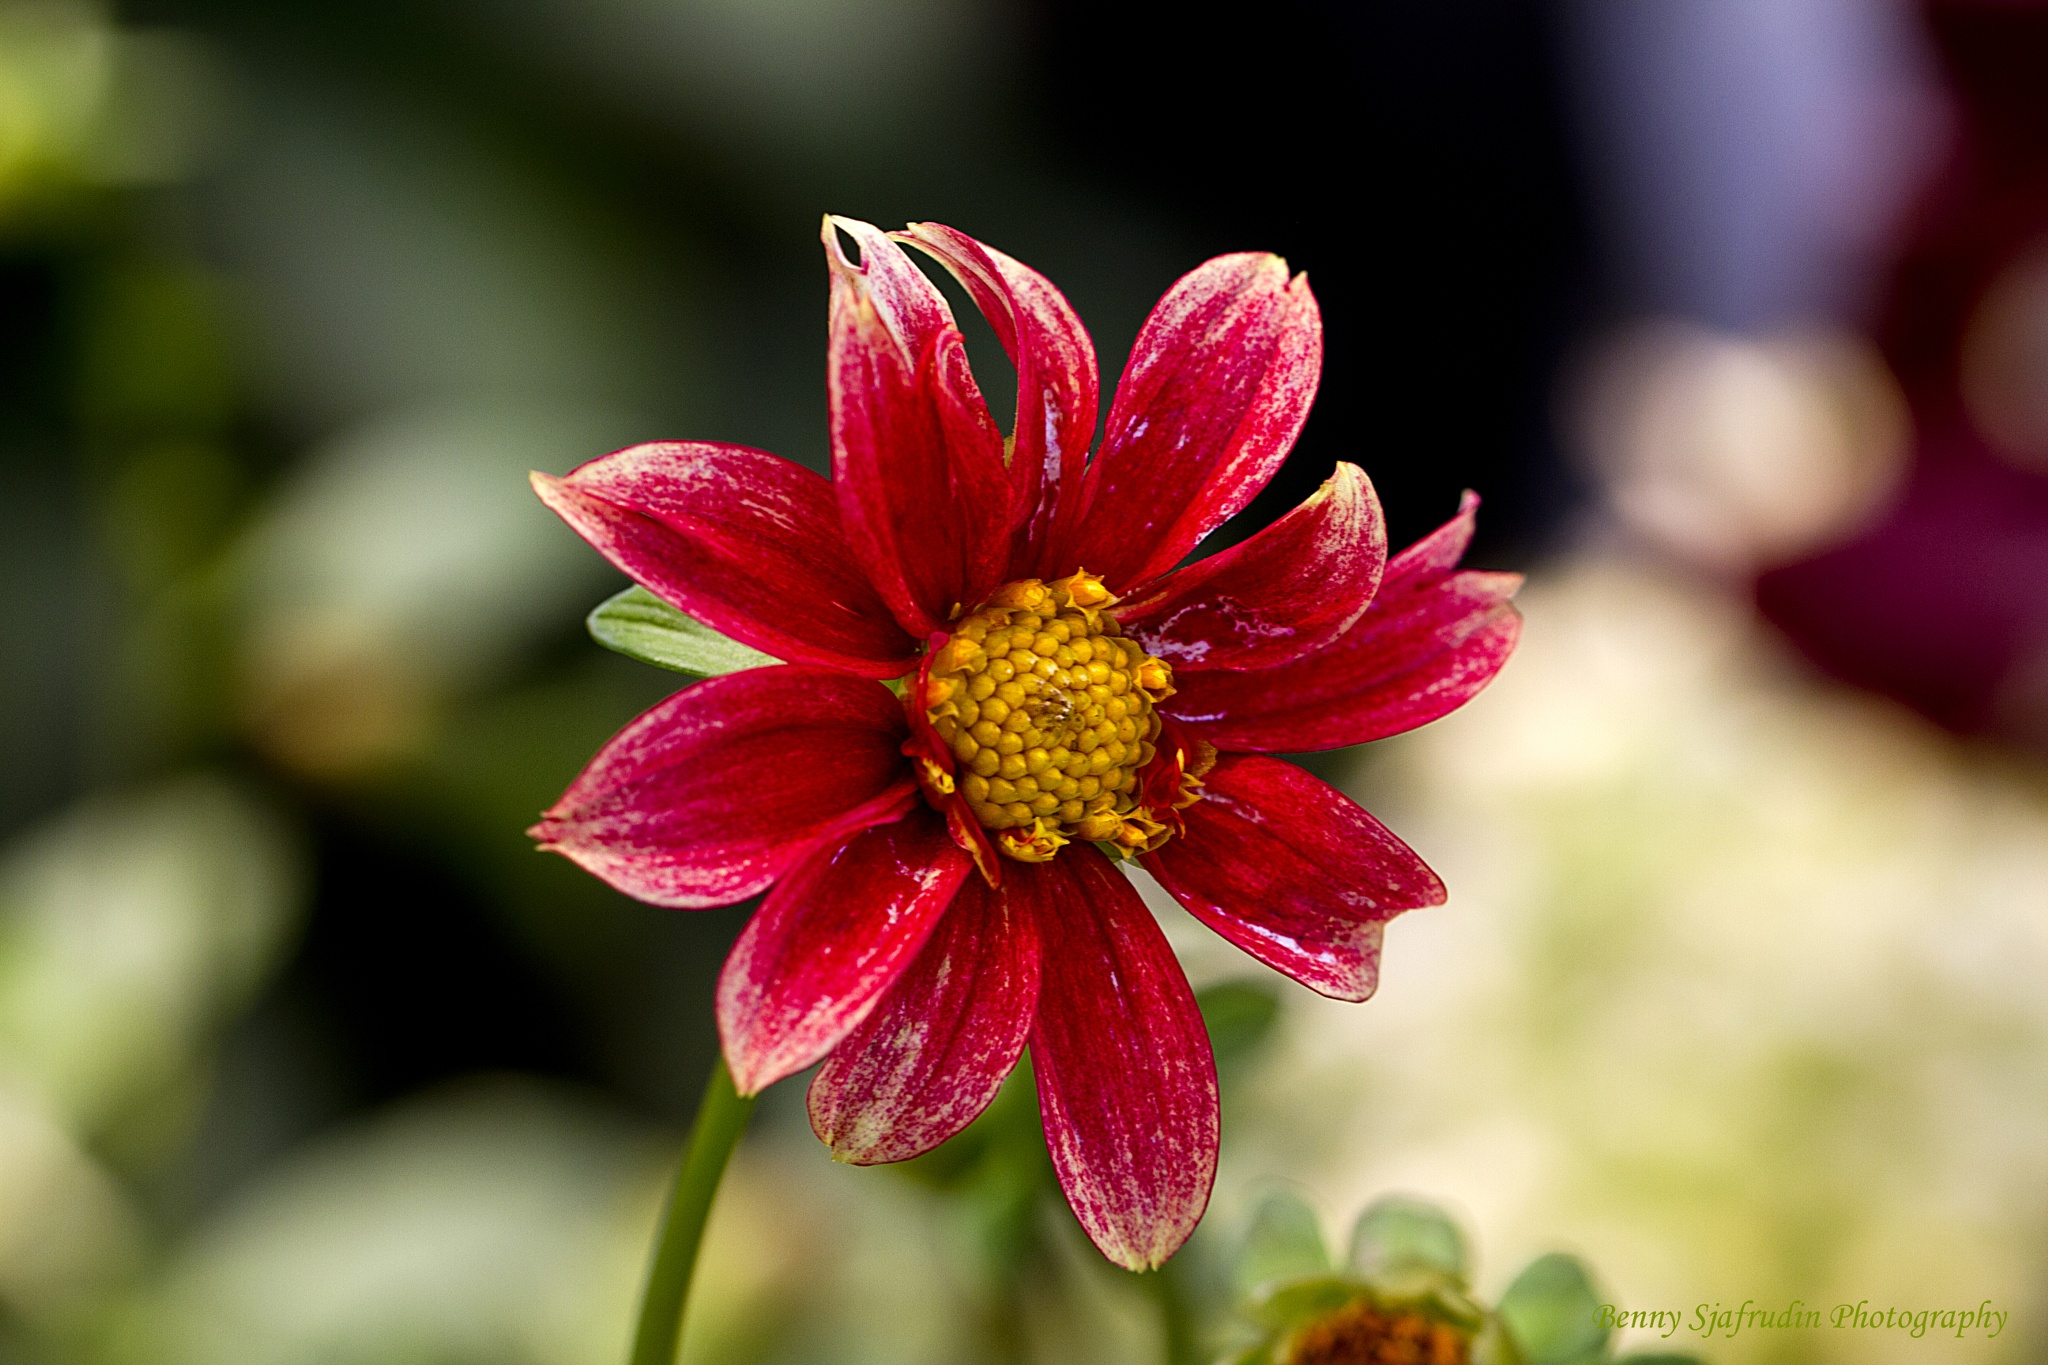 Flower by bennysjafrudin